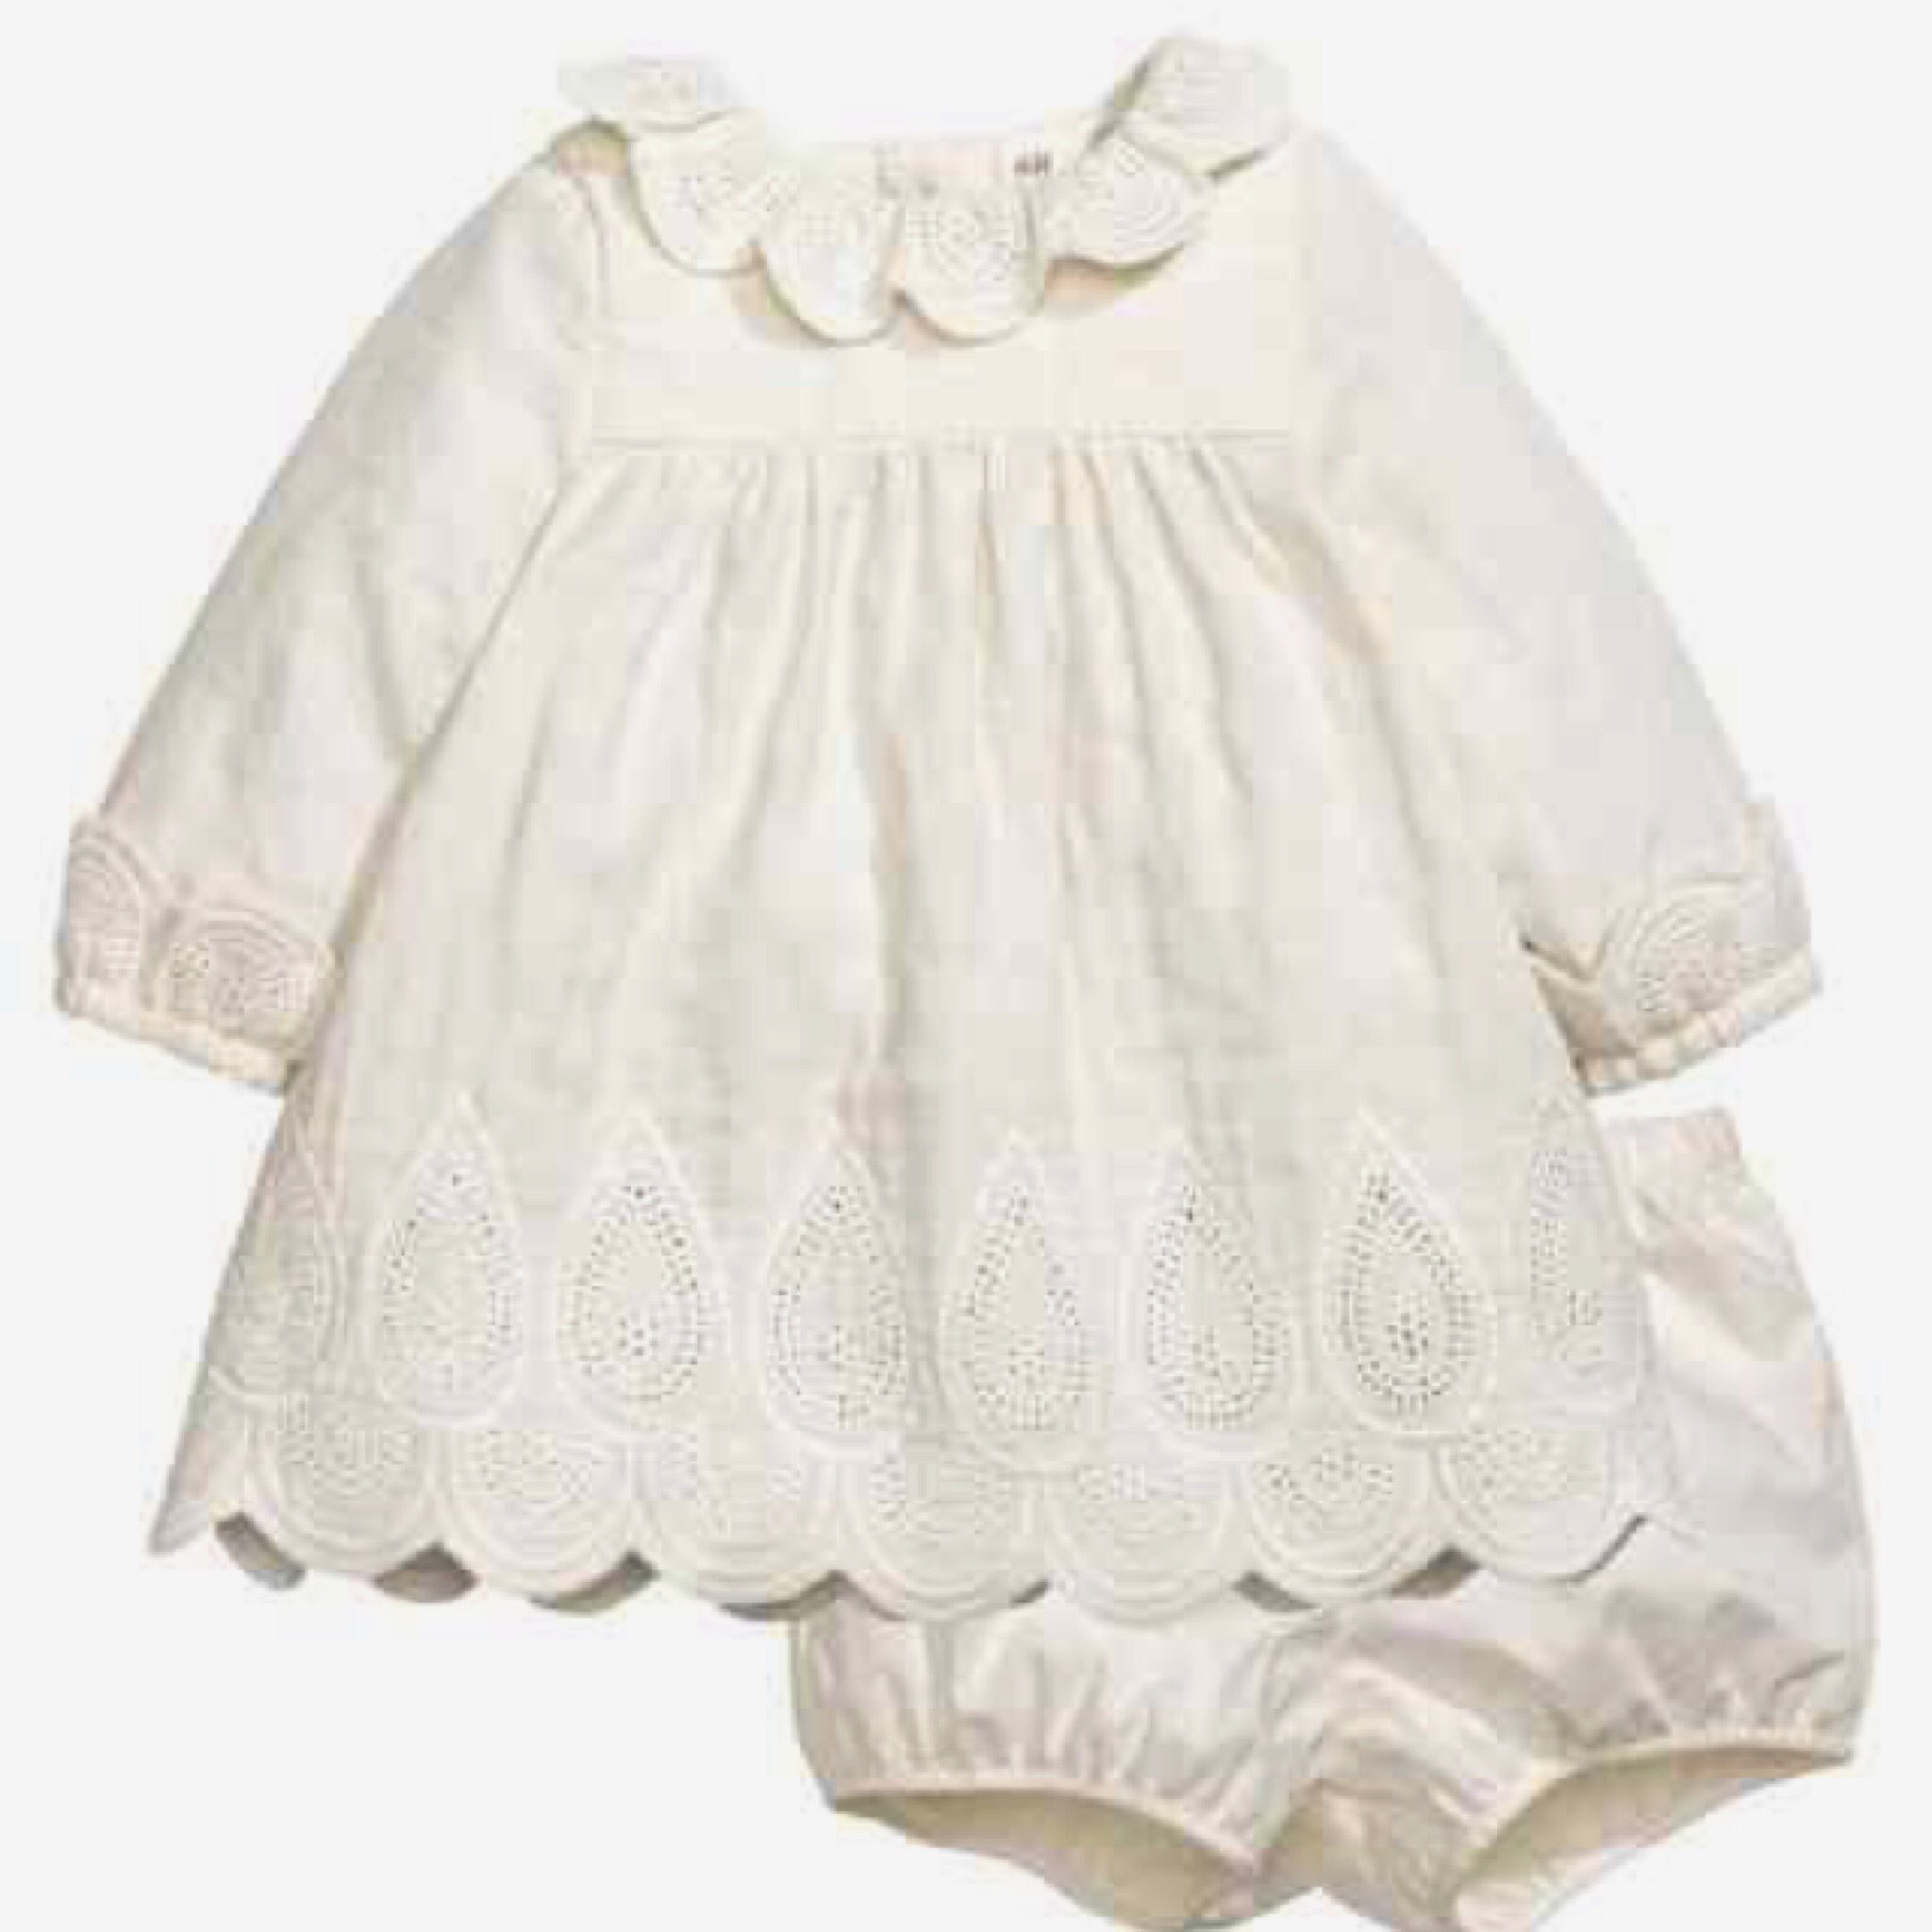 69b6e1dc5ad5c تفصيل ملابس اطفال